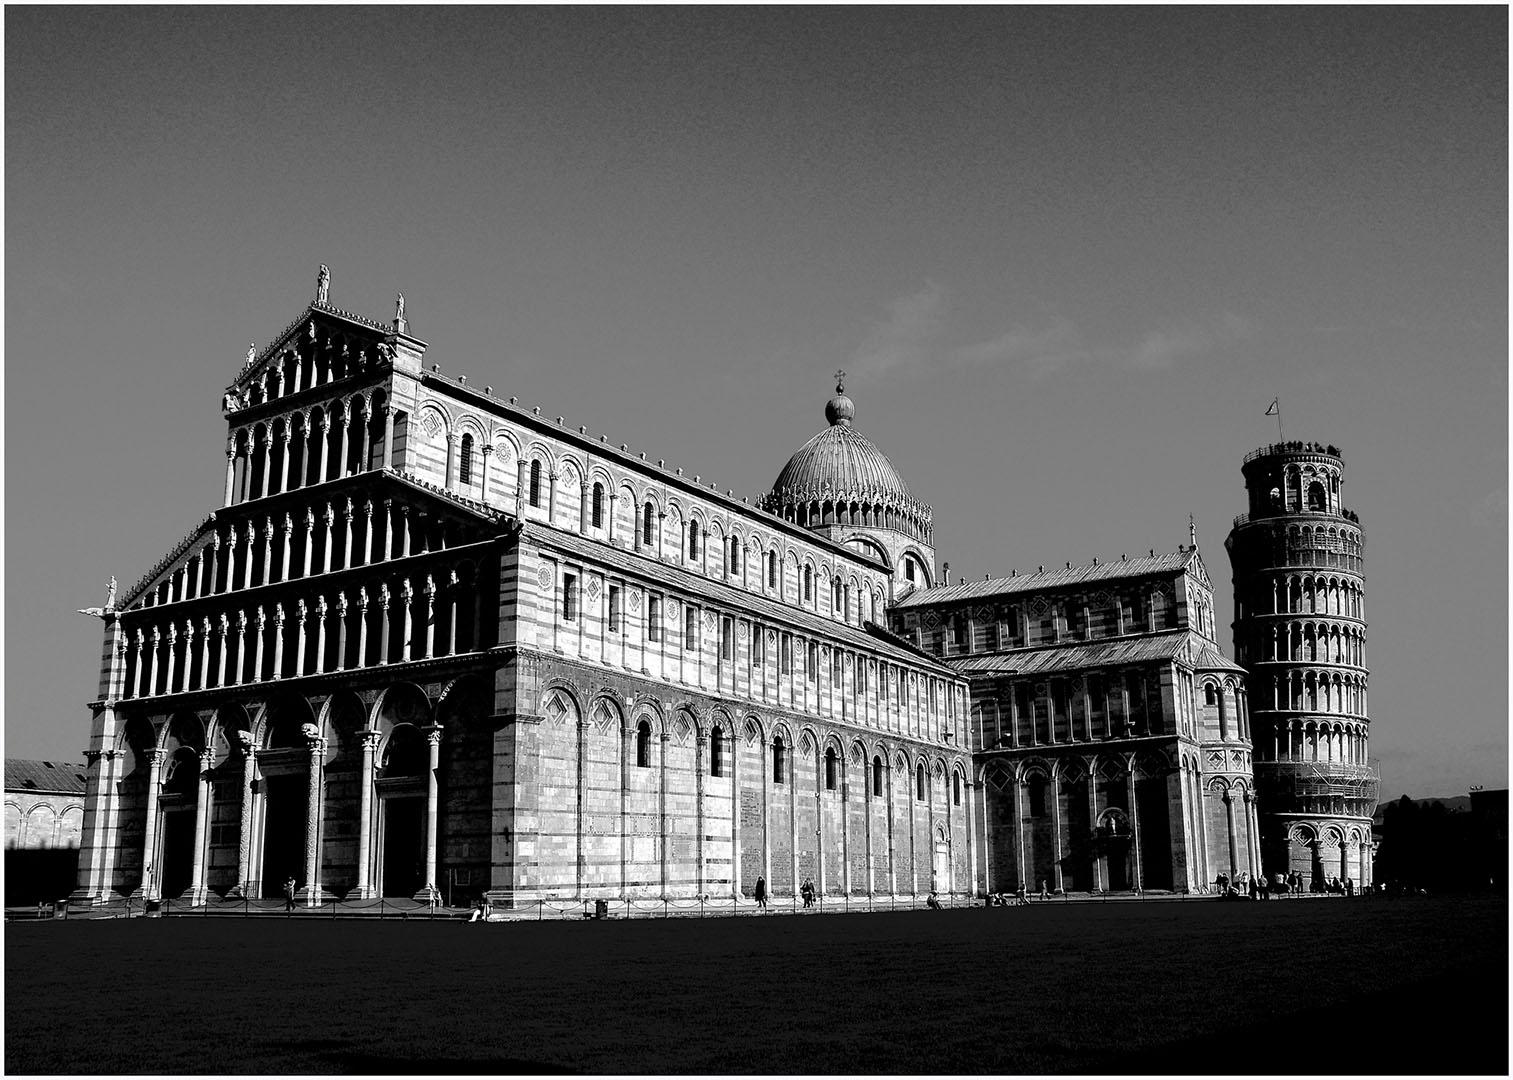 Pisa-Piazza_dei_Miracoli_027_I08-10.43